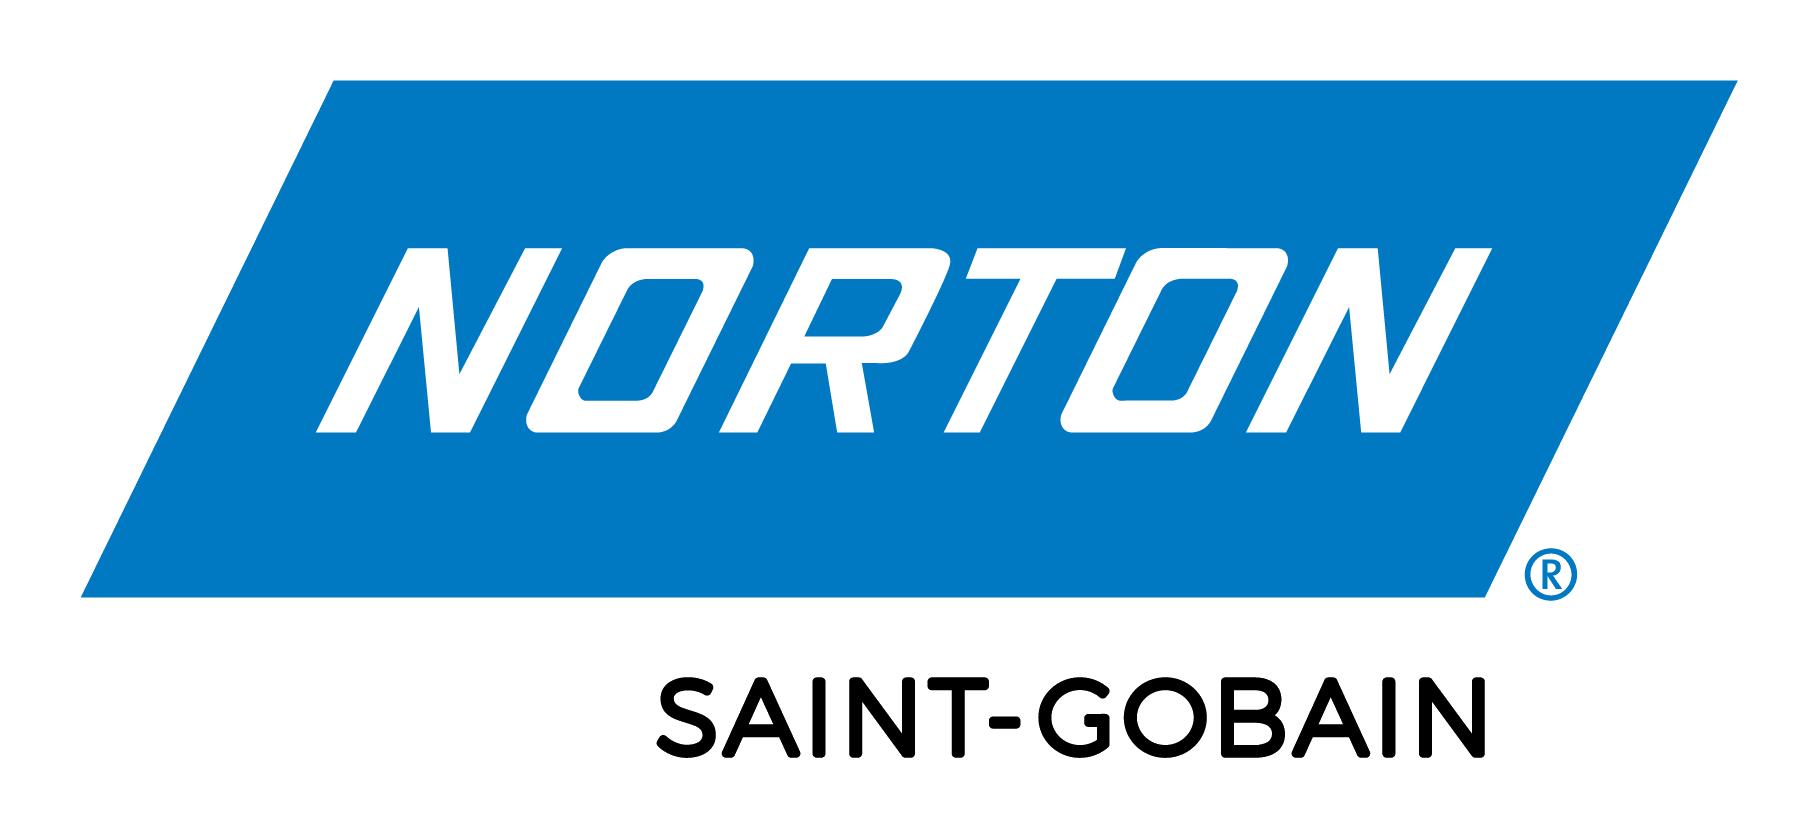 SG_Norton_logo_rgb_21